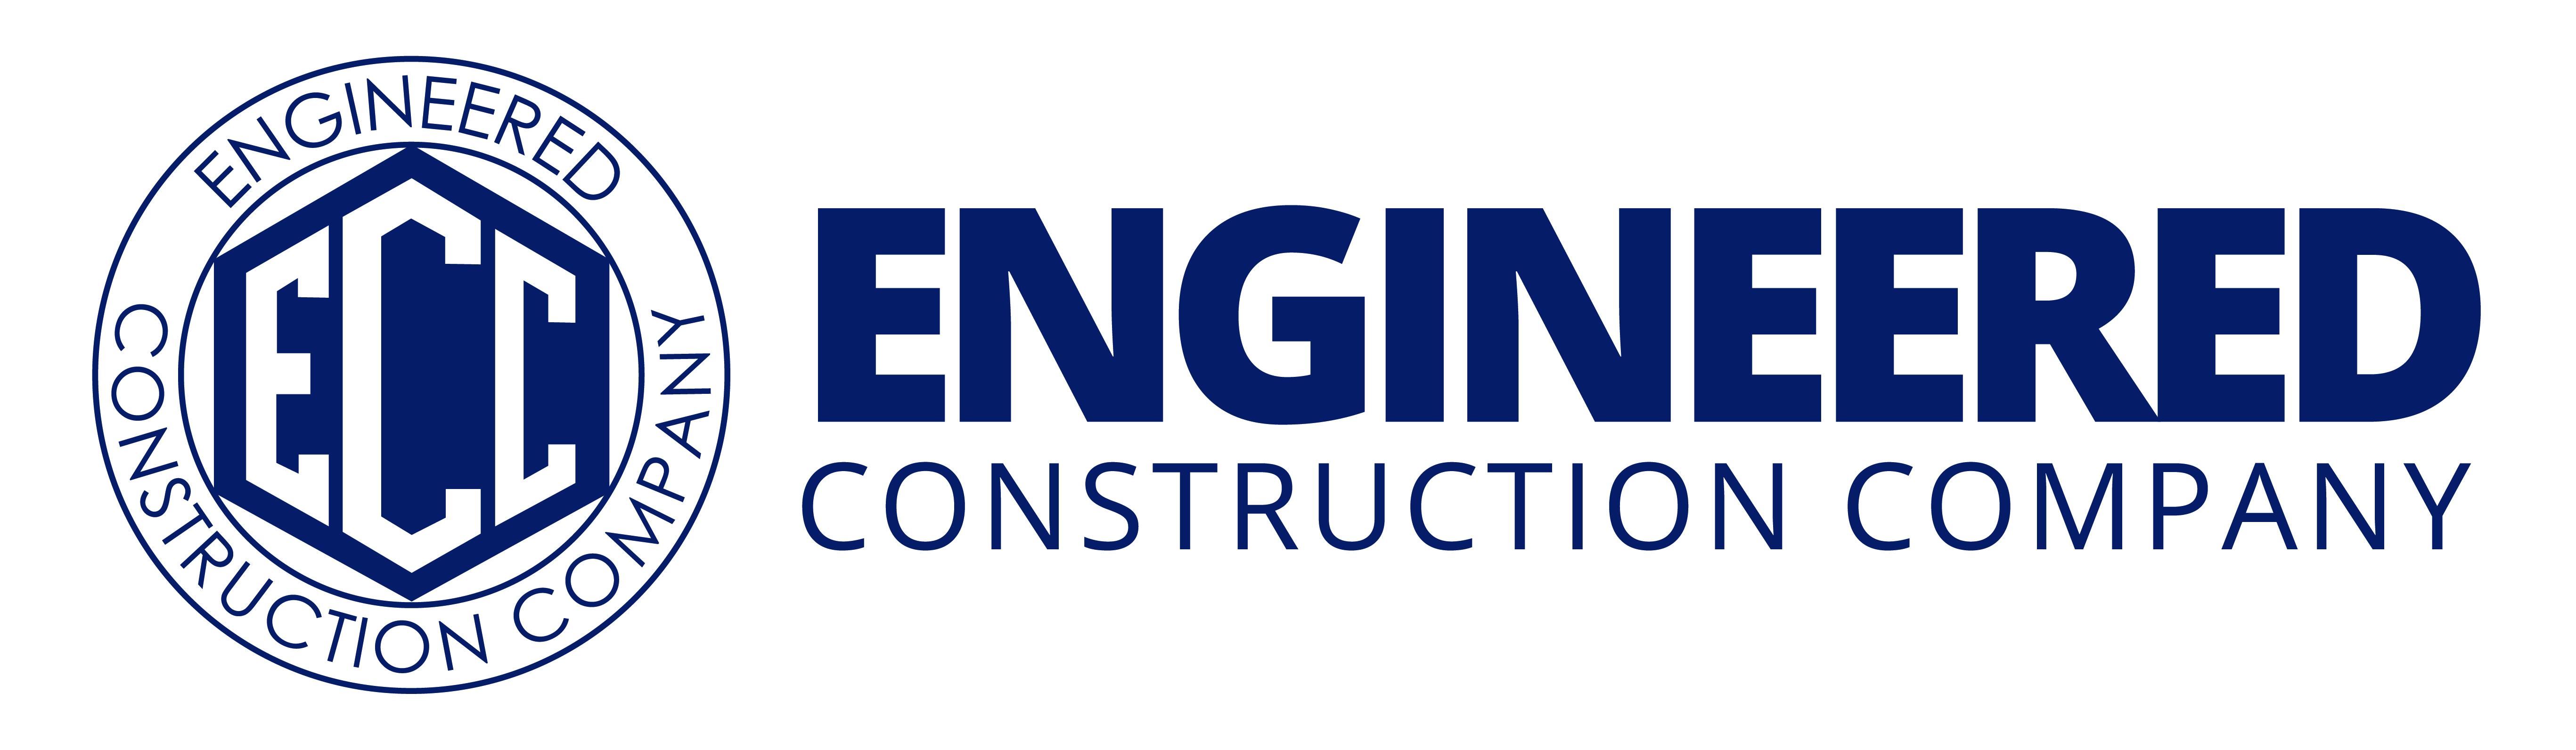 Sponsor Engineered Construction Company